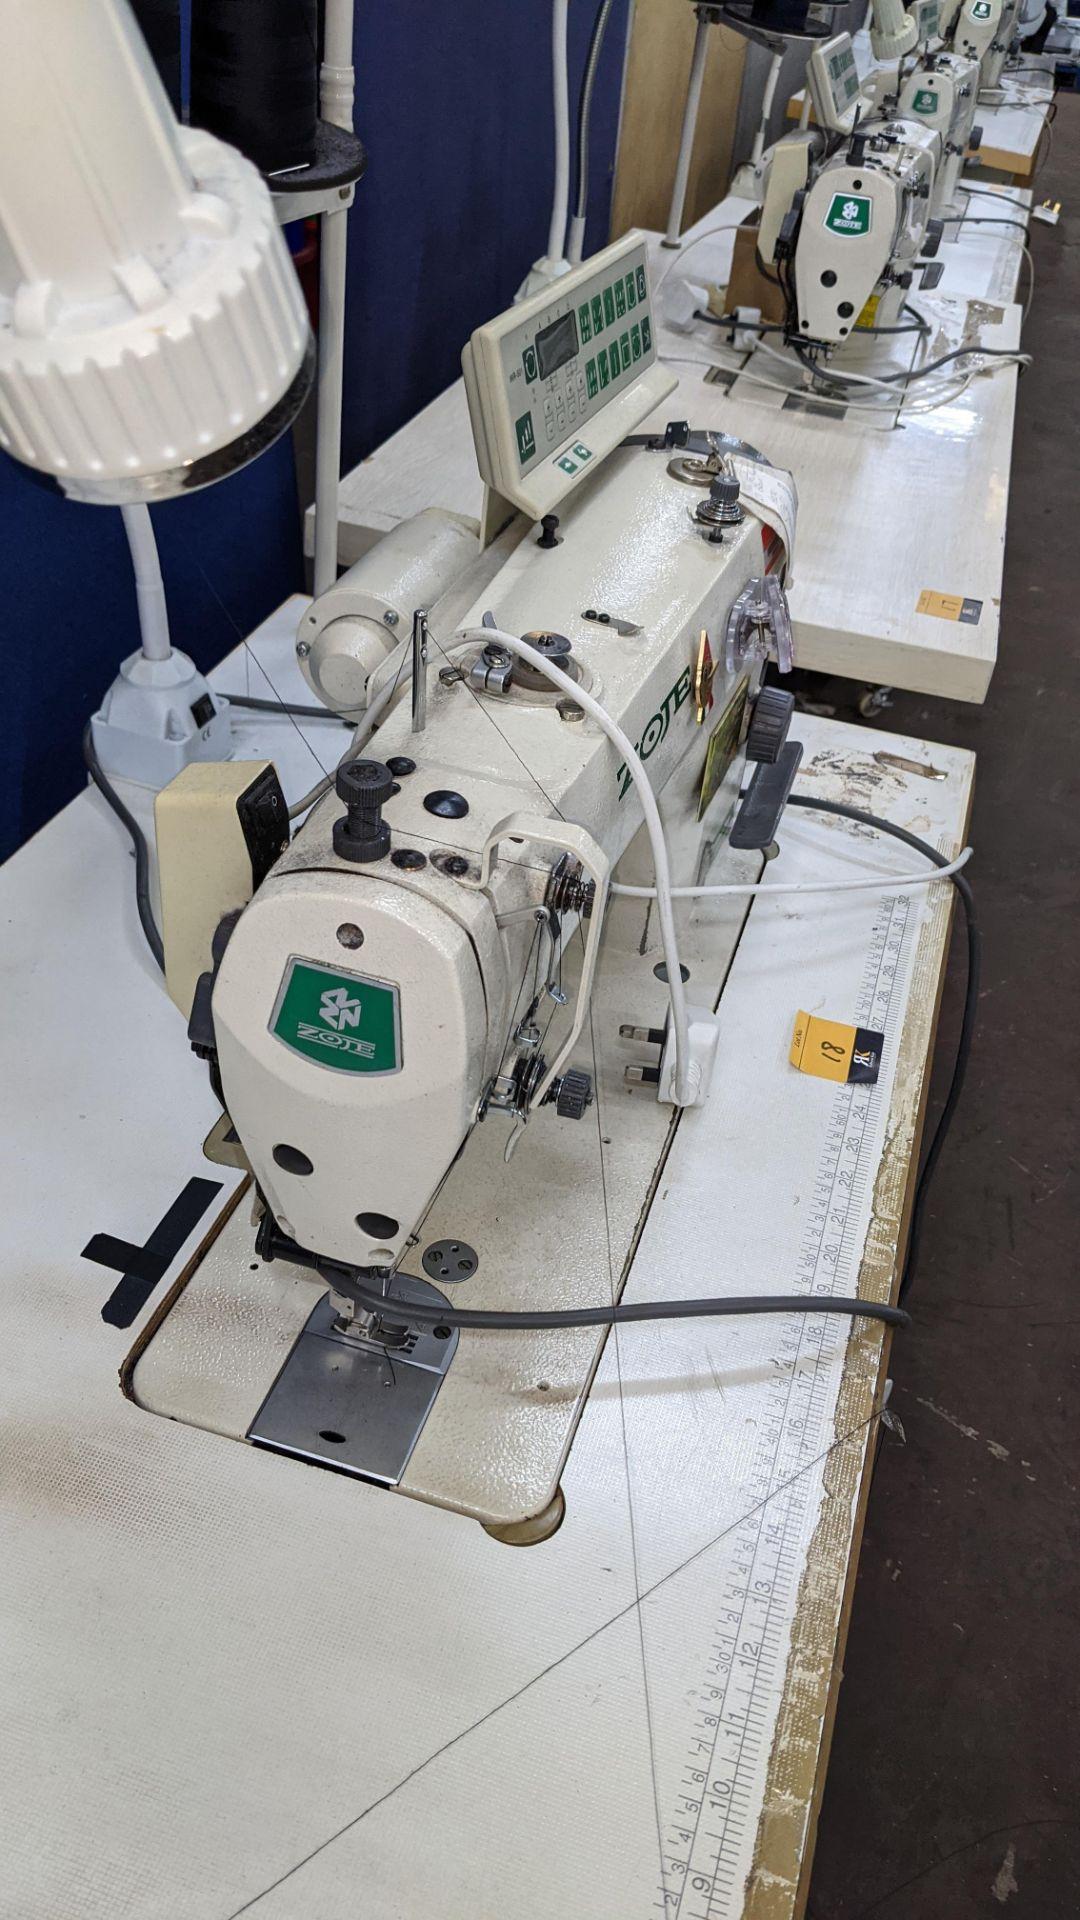 Zoje model ZJ9800A-D3B/PF lockstitch sewing machine with model WR-501 digital controller - Image 9 of 20